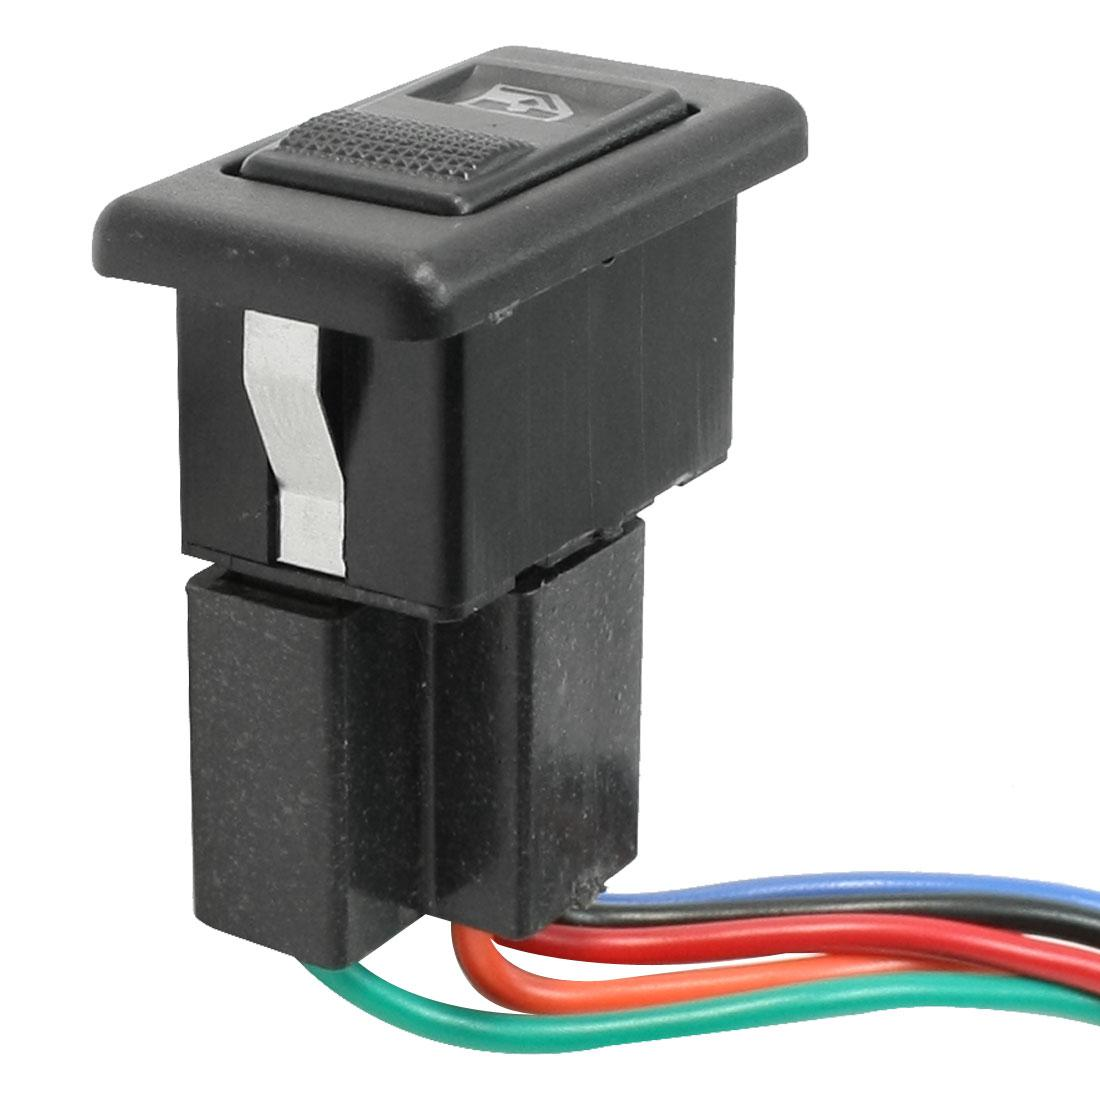 warn rocker switch wiring diagram images waren atv winch wiring wire window switch diagramwindowcar wiring diagram pictures